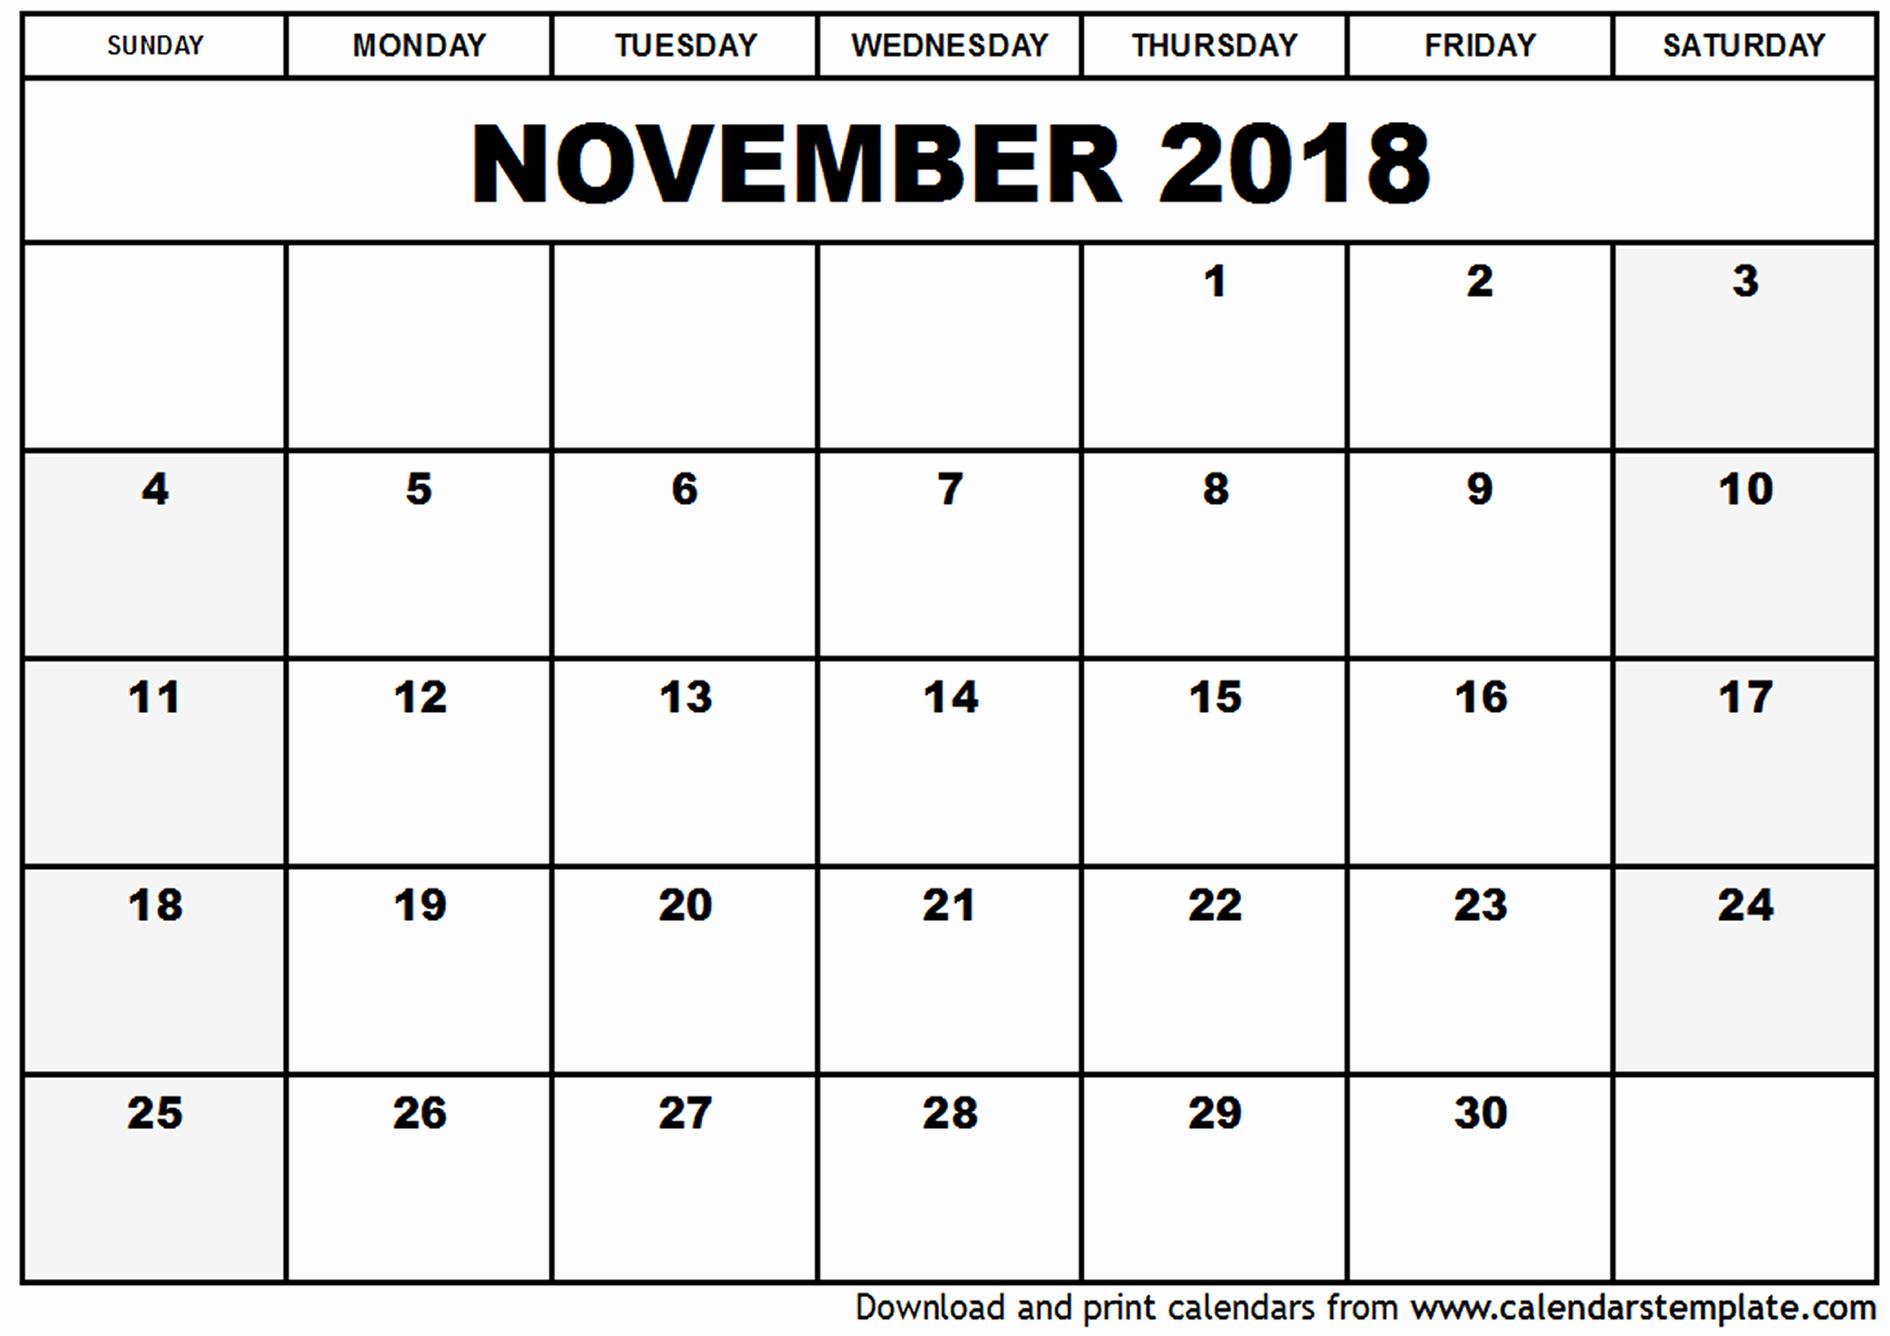 November 2018 Calendar Printable Template